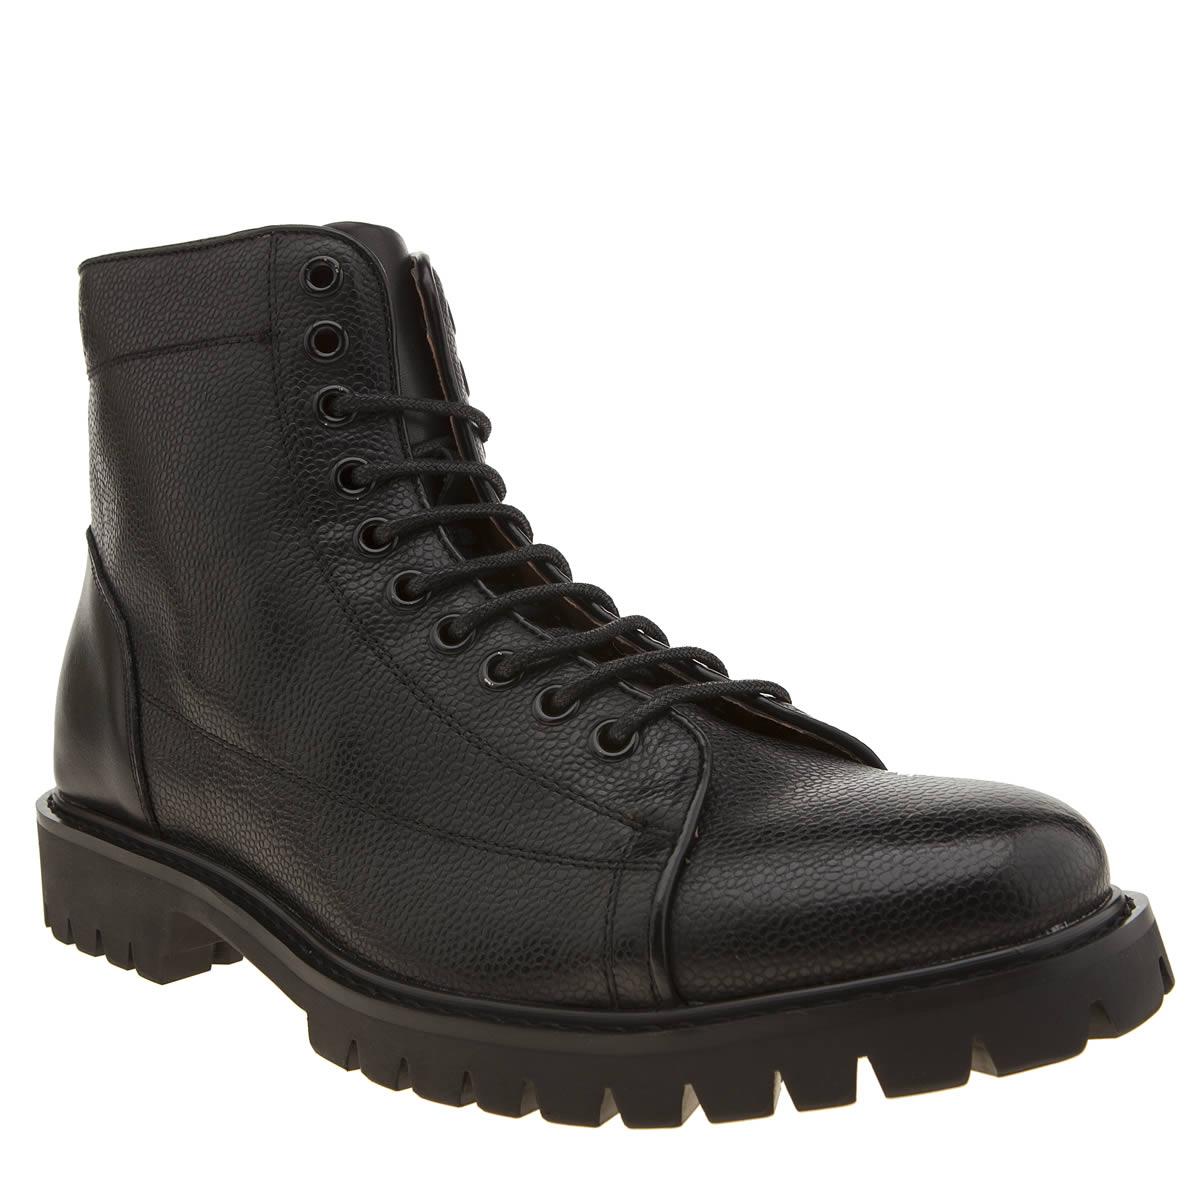 Peter Werth Peter Werth Black Oldman Monkey Boots